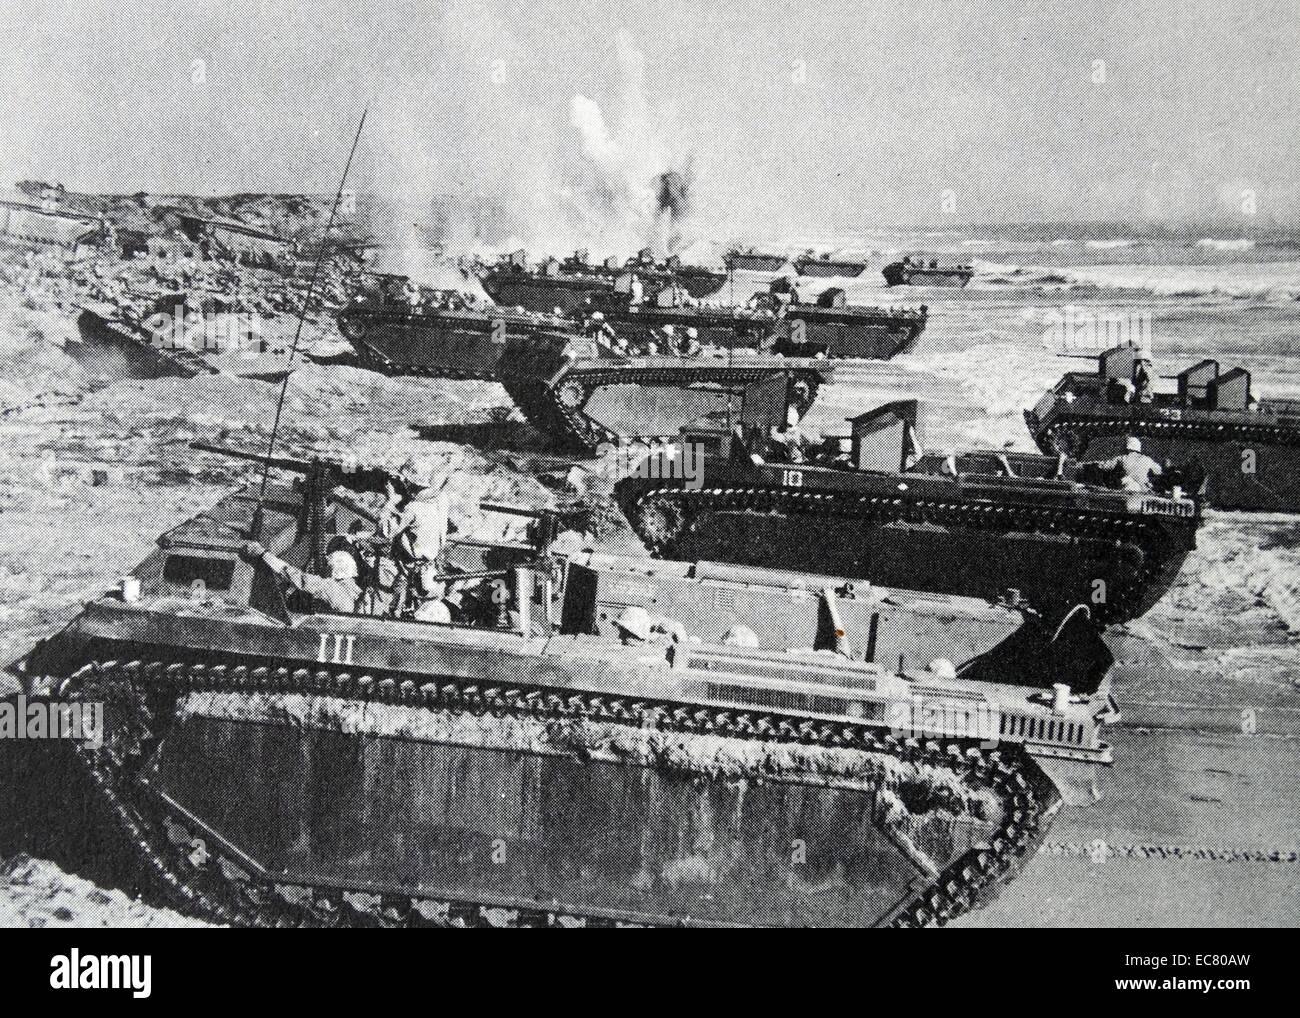 Amphibious Pelicula 1949 movies stock photos & 1949 movies stock images - alamy